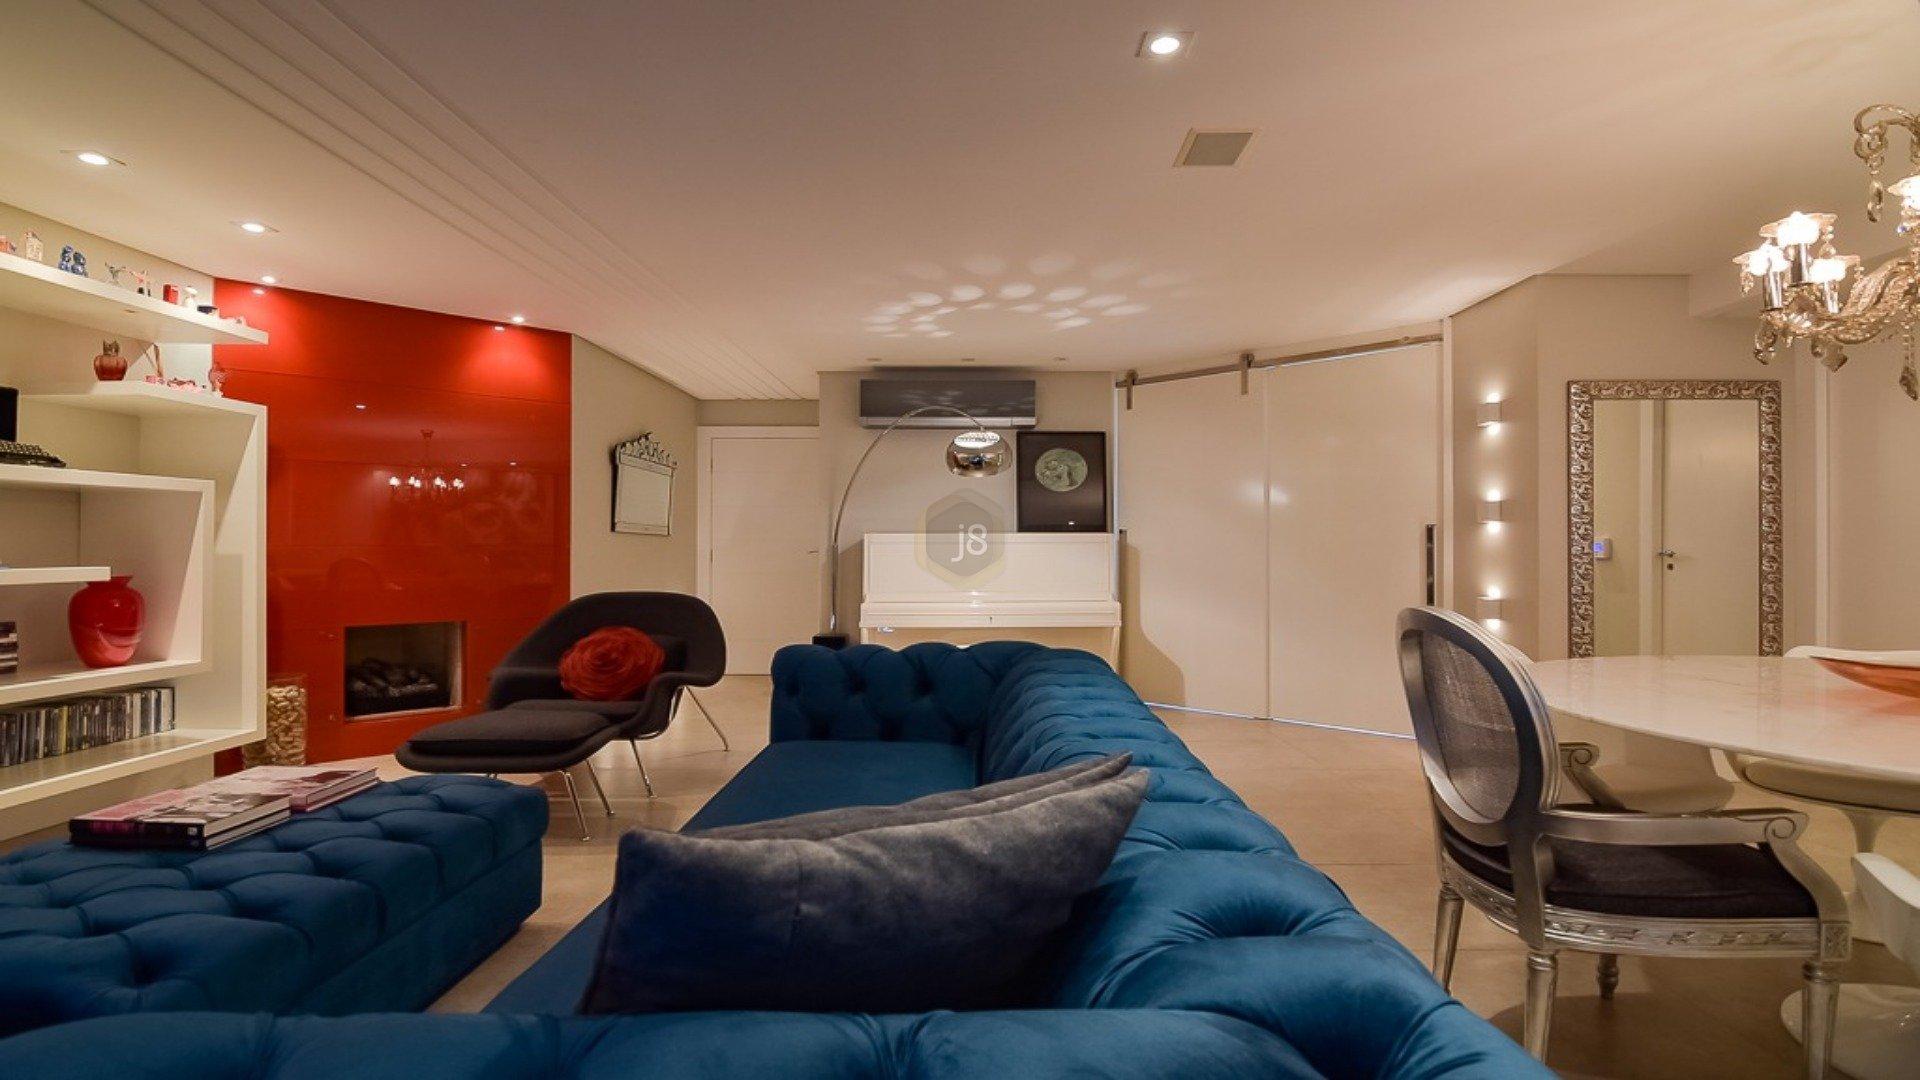 Foto de destaque Charmoso e aconchegante apartamento no ecoville !